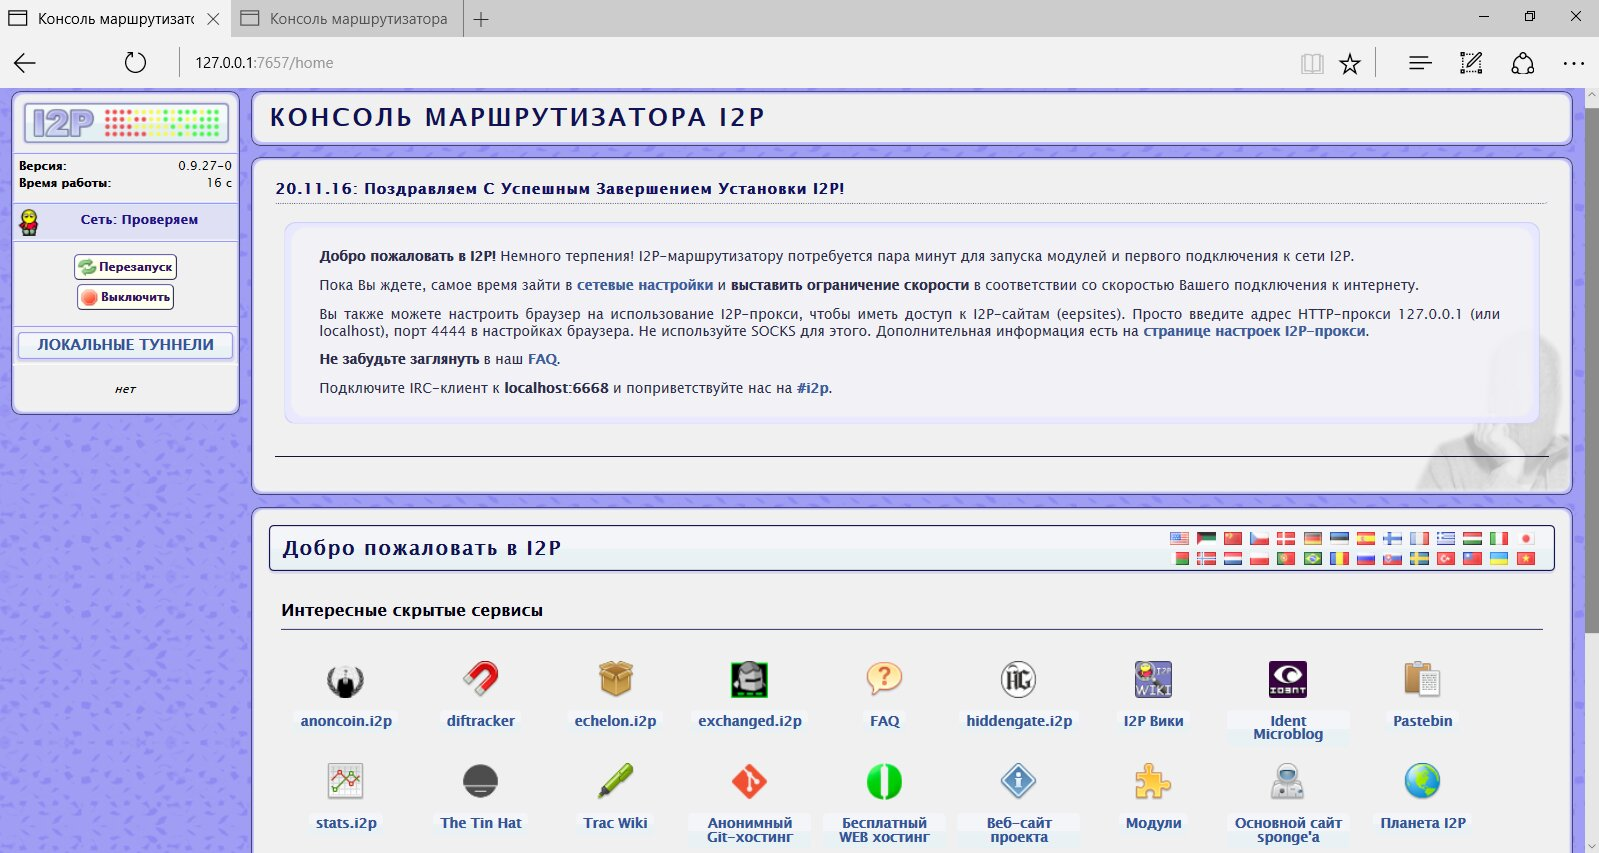 Начало работы с I2P